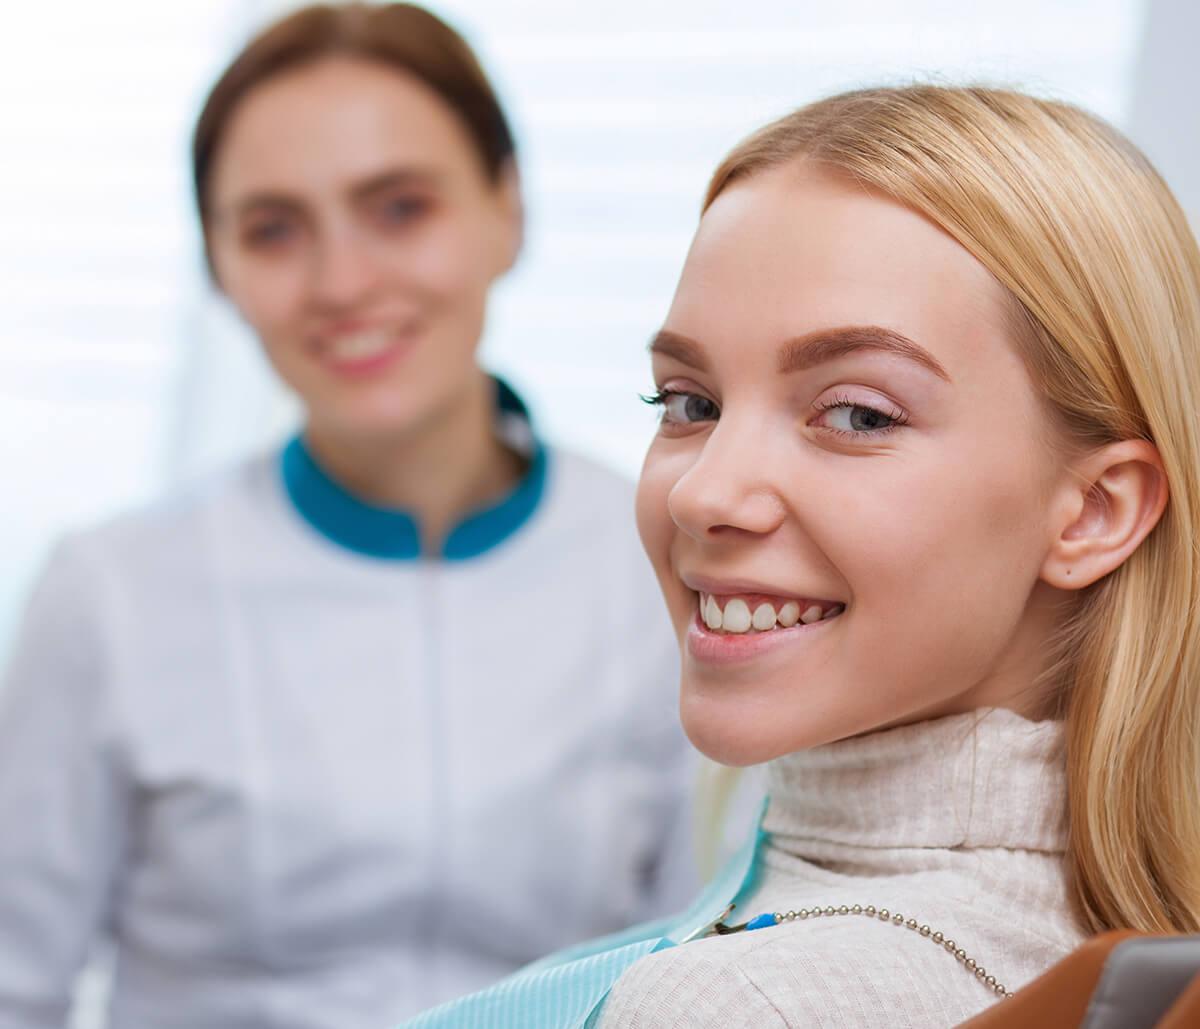 Teeth Implant Dentist at Bright Smiles Dental Studio in Glendale CA Area